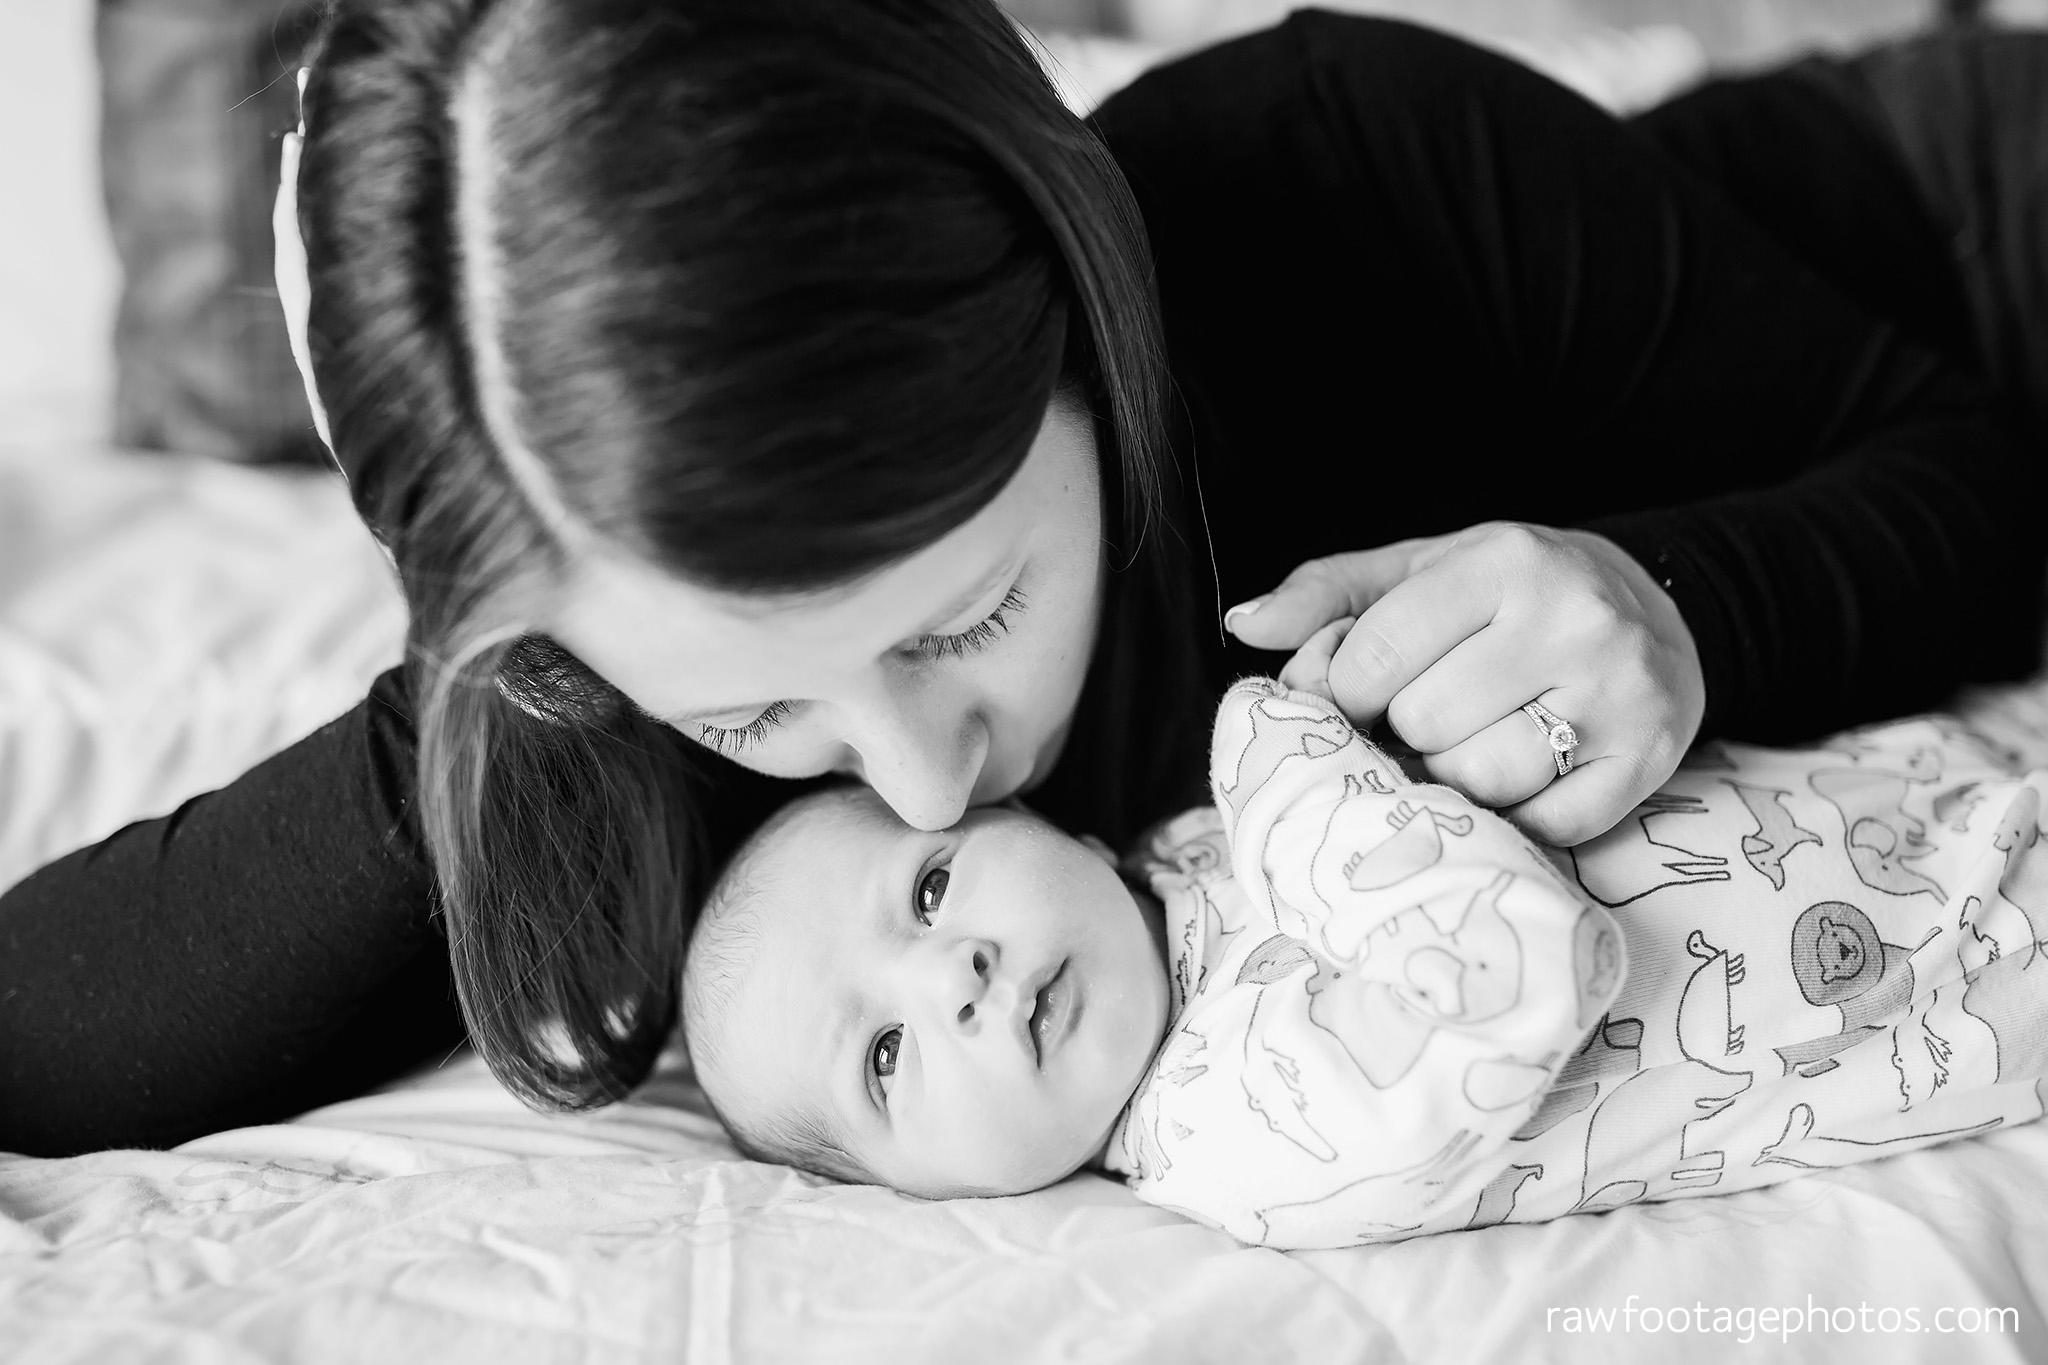 london_ontario_newborn_lifestyle_photographer-baby_nate-raw_footage_photography015.jpg